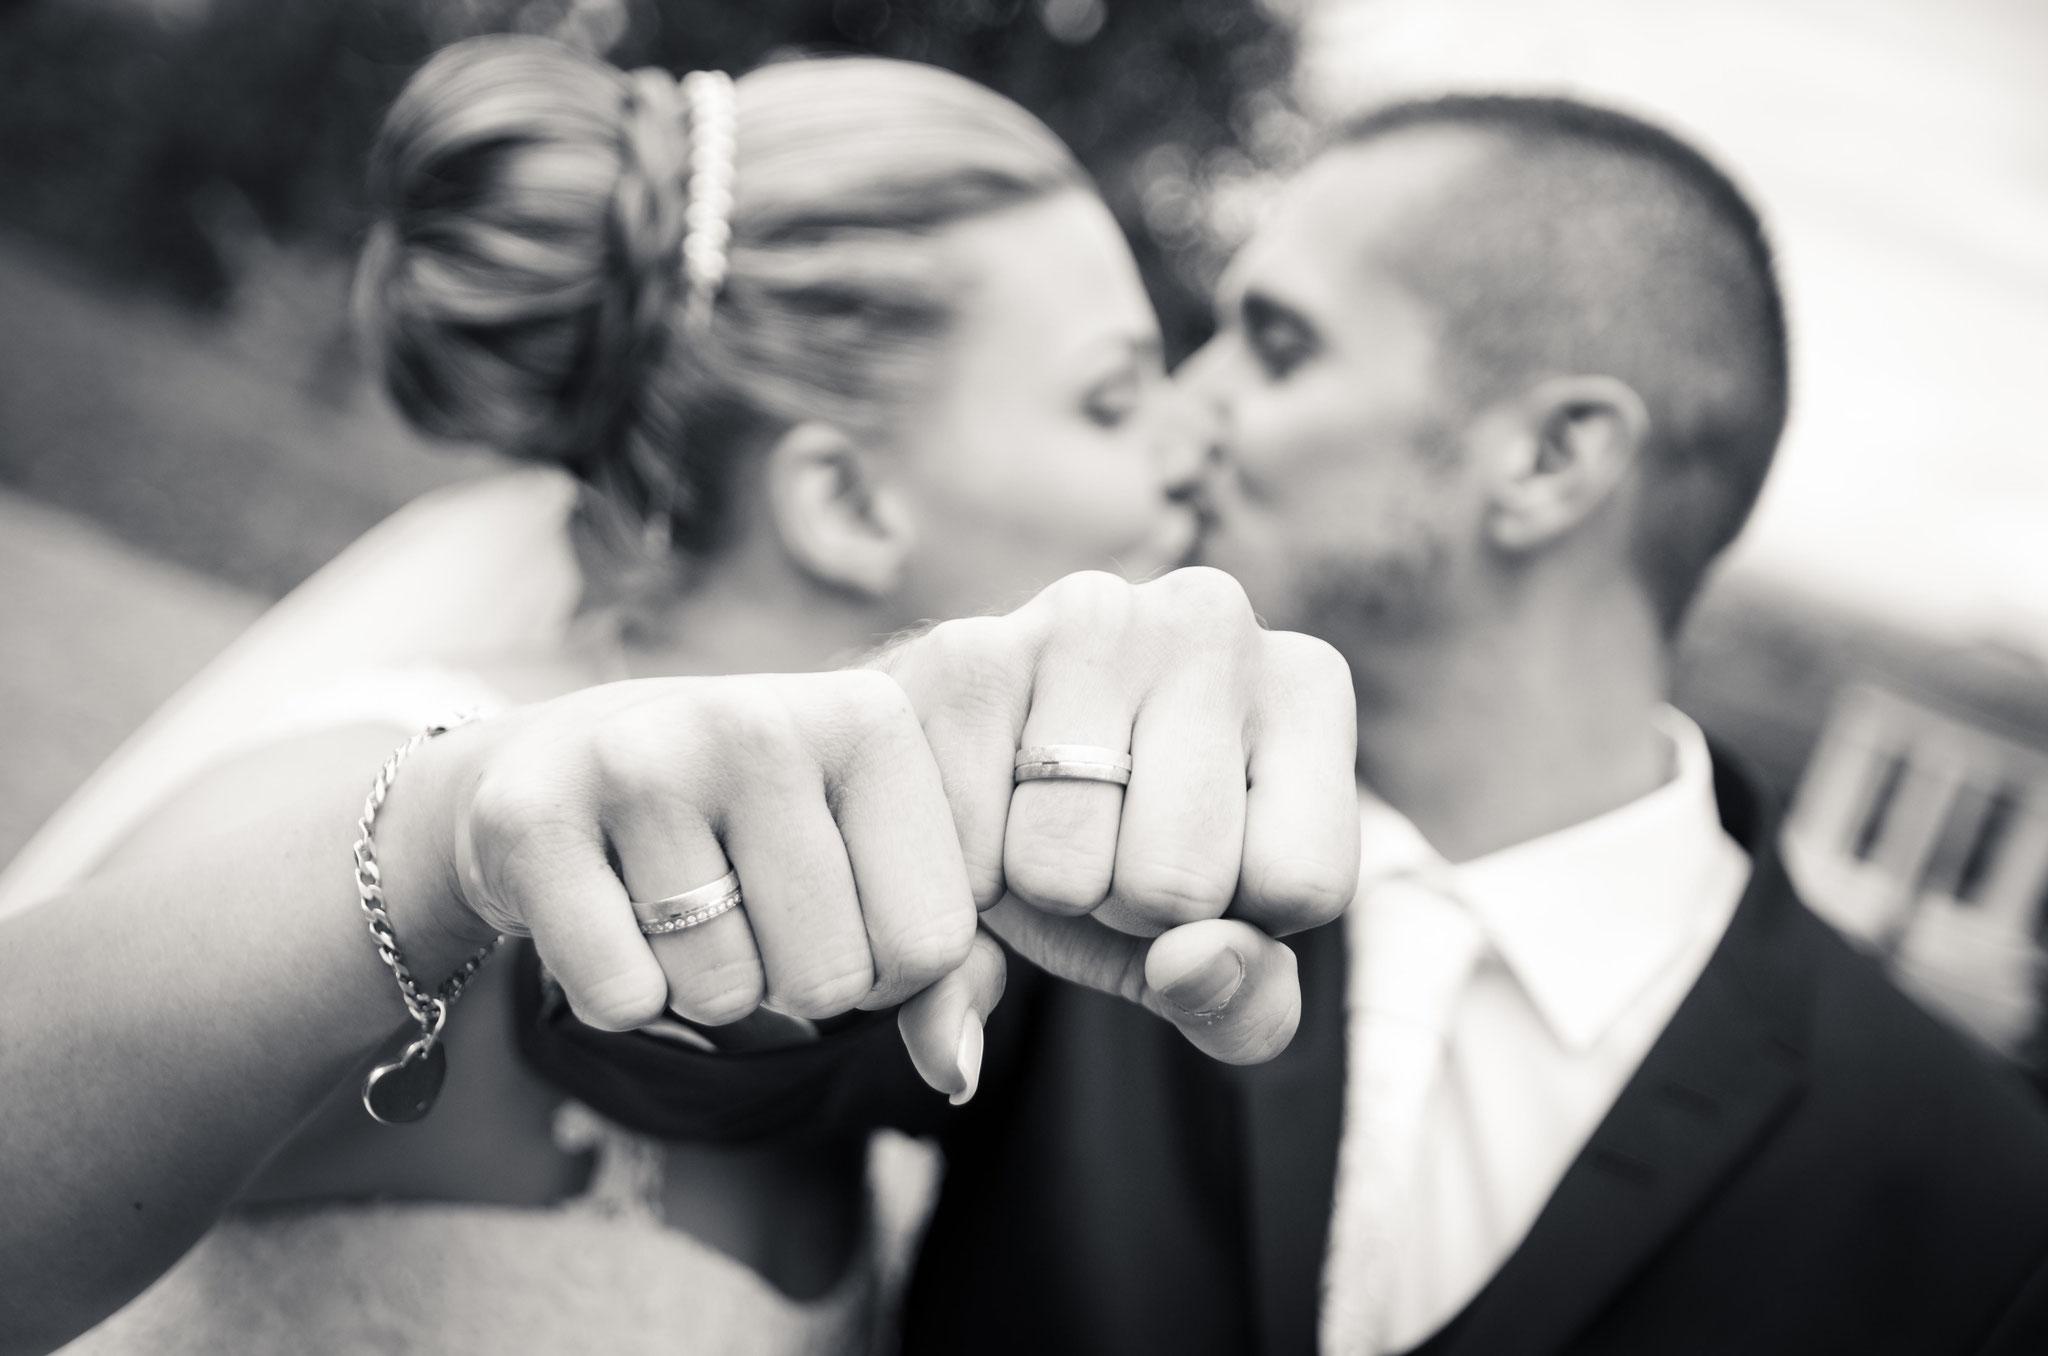 Hochzeitsfotograf Ortenau Daniel Keller / Paar mit Eheringe